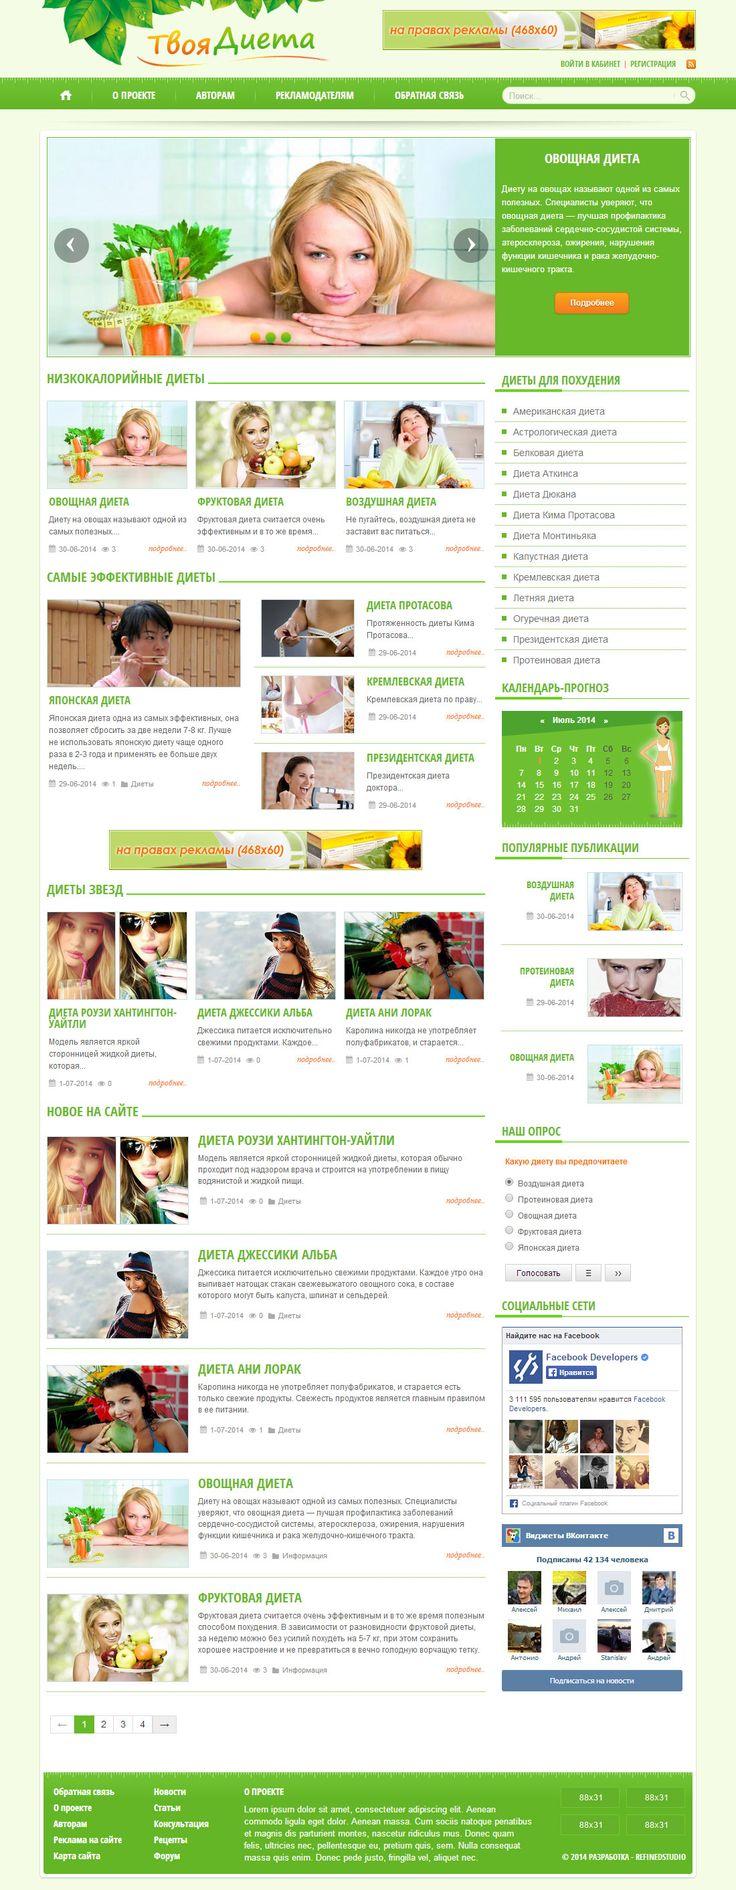 YourDiet - шаблон для сайта о правильном питании и детах на DLE #templates #website #шаблон #сайт #web